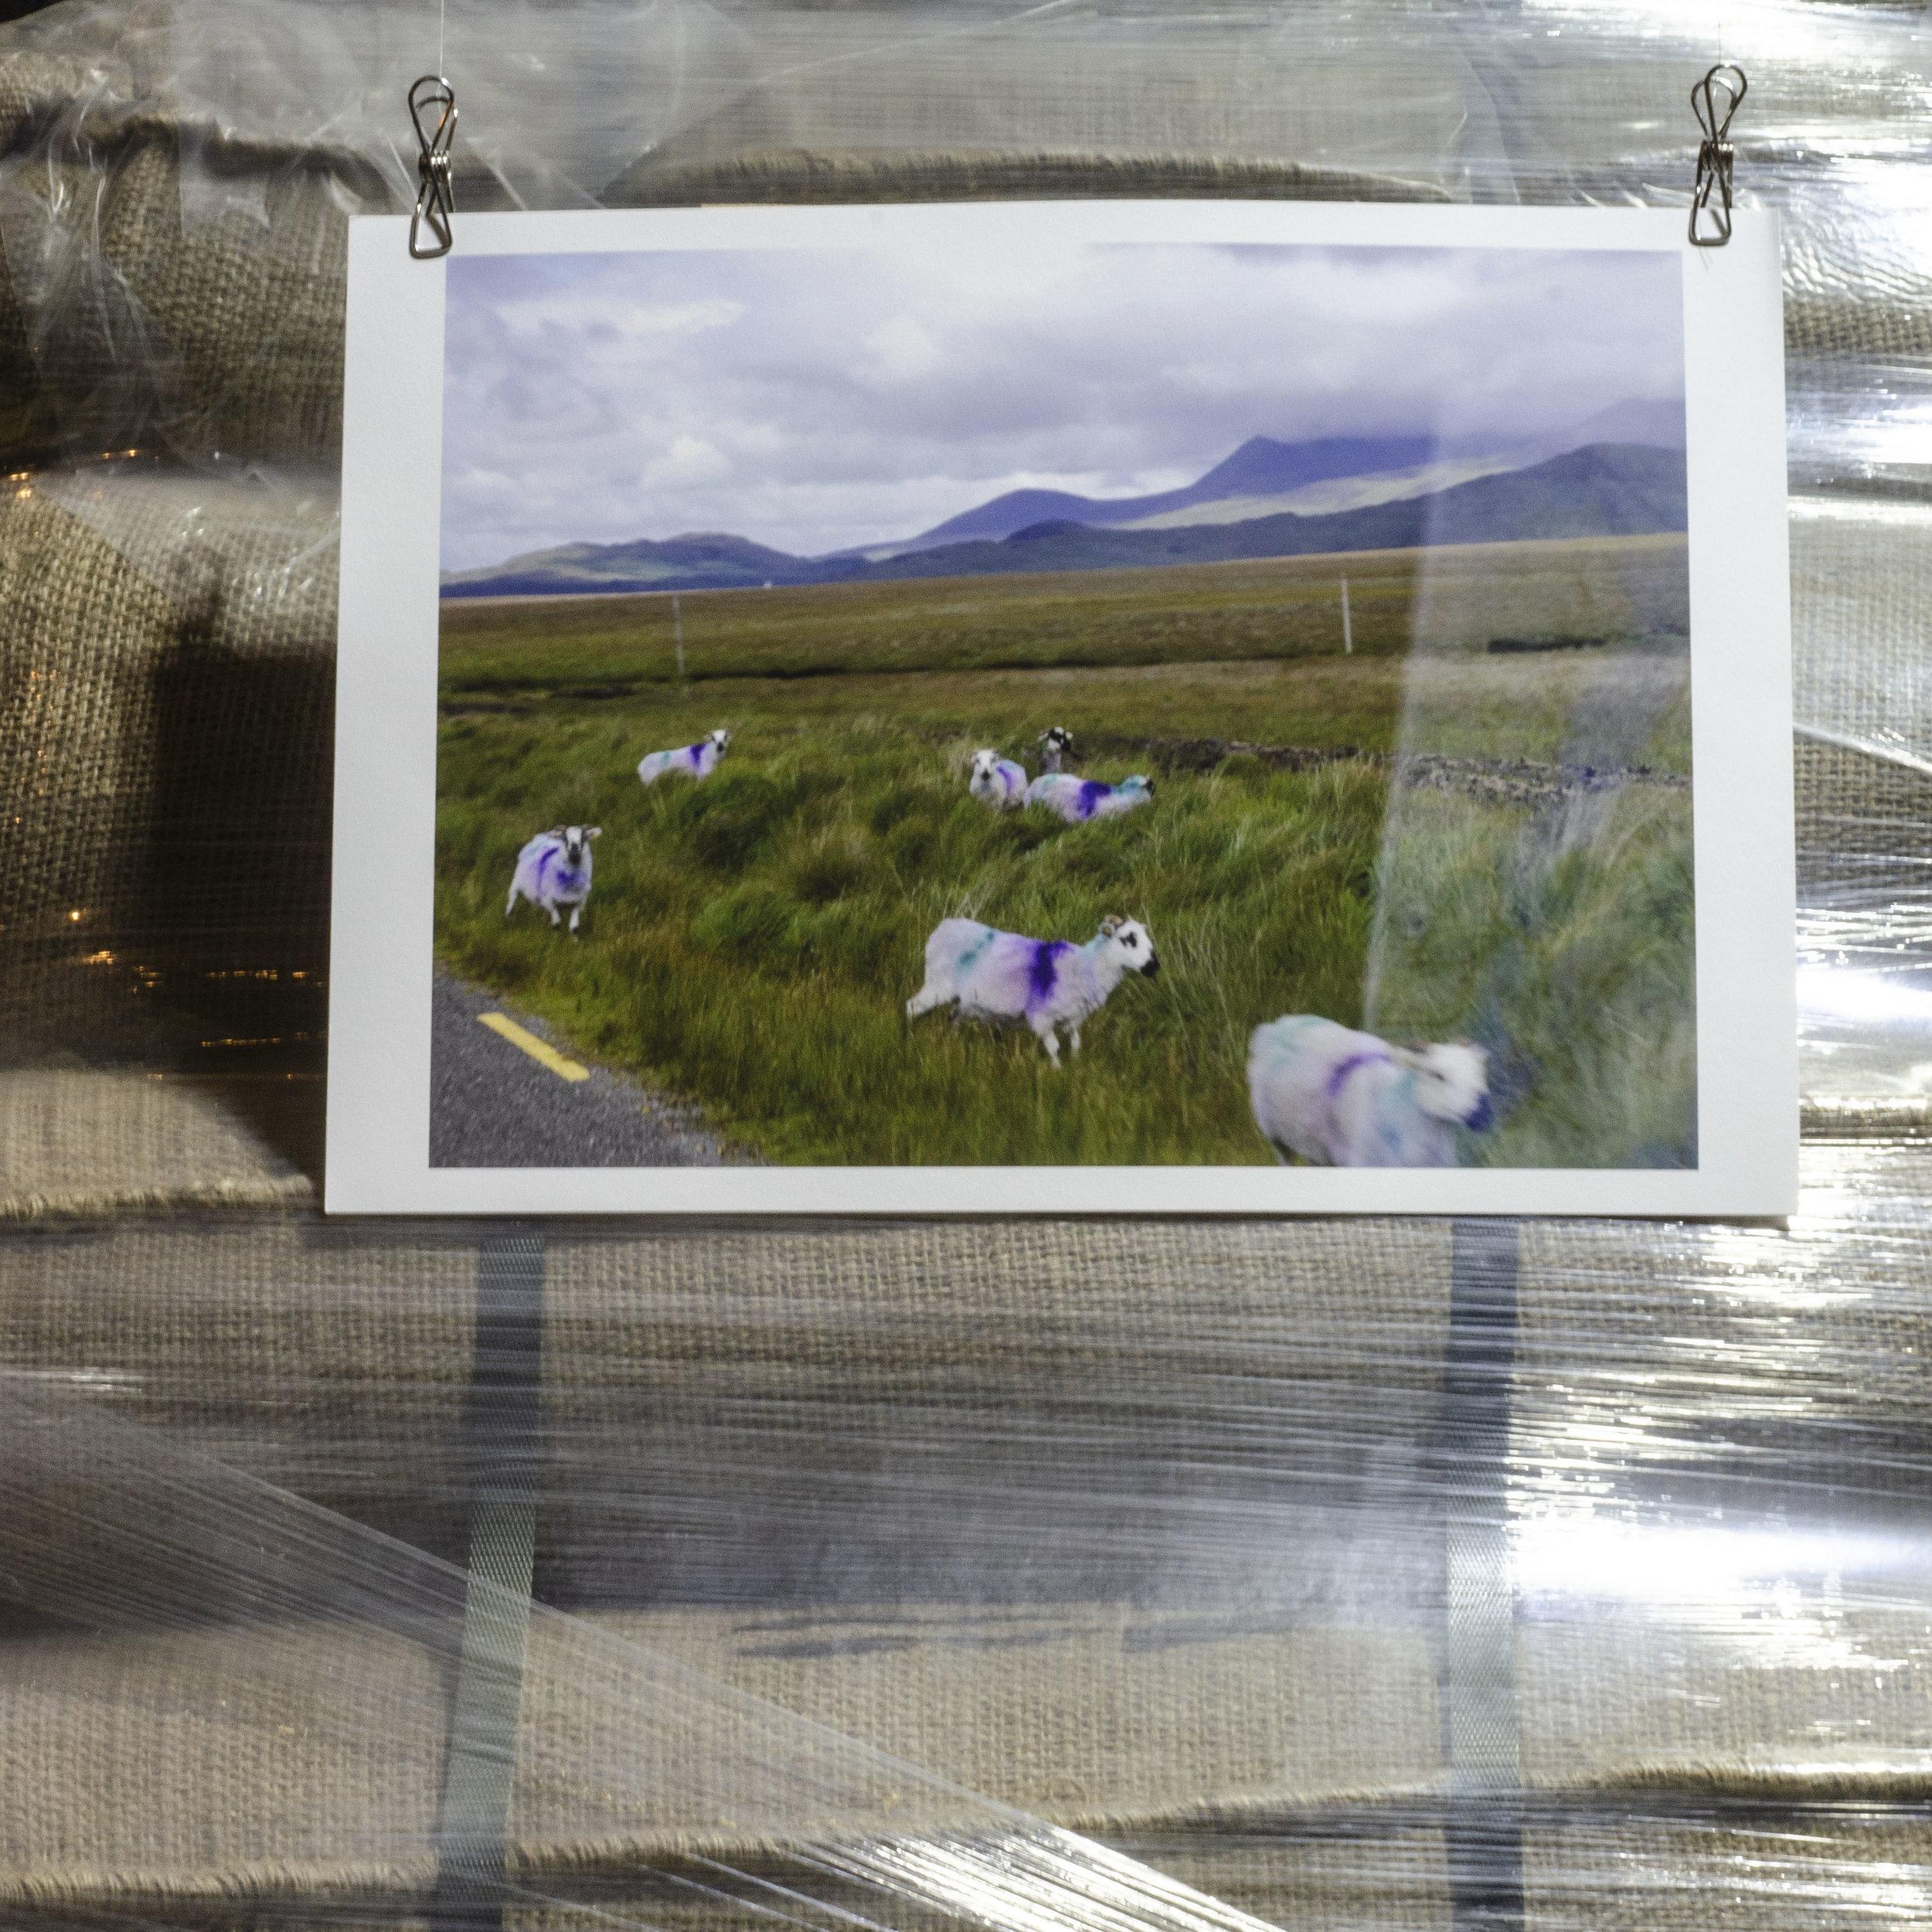 Antony Lyons, Ireland, From the exchange 'Through the Window,' with Zoe Galinsoga.jpg